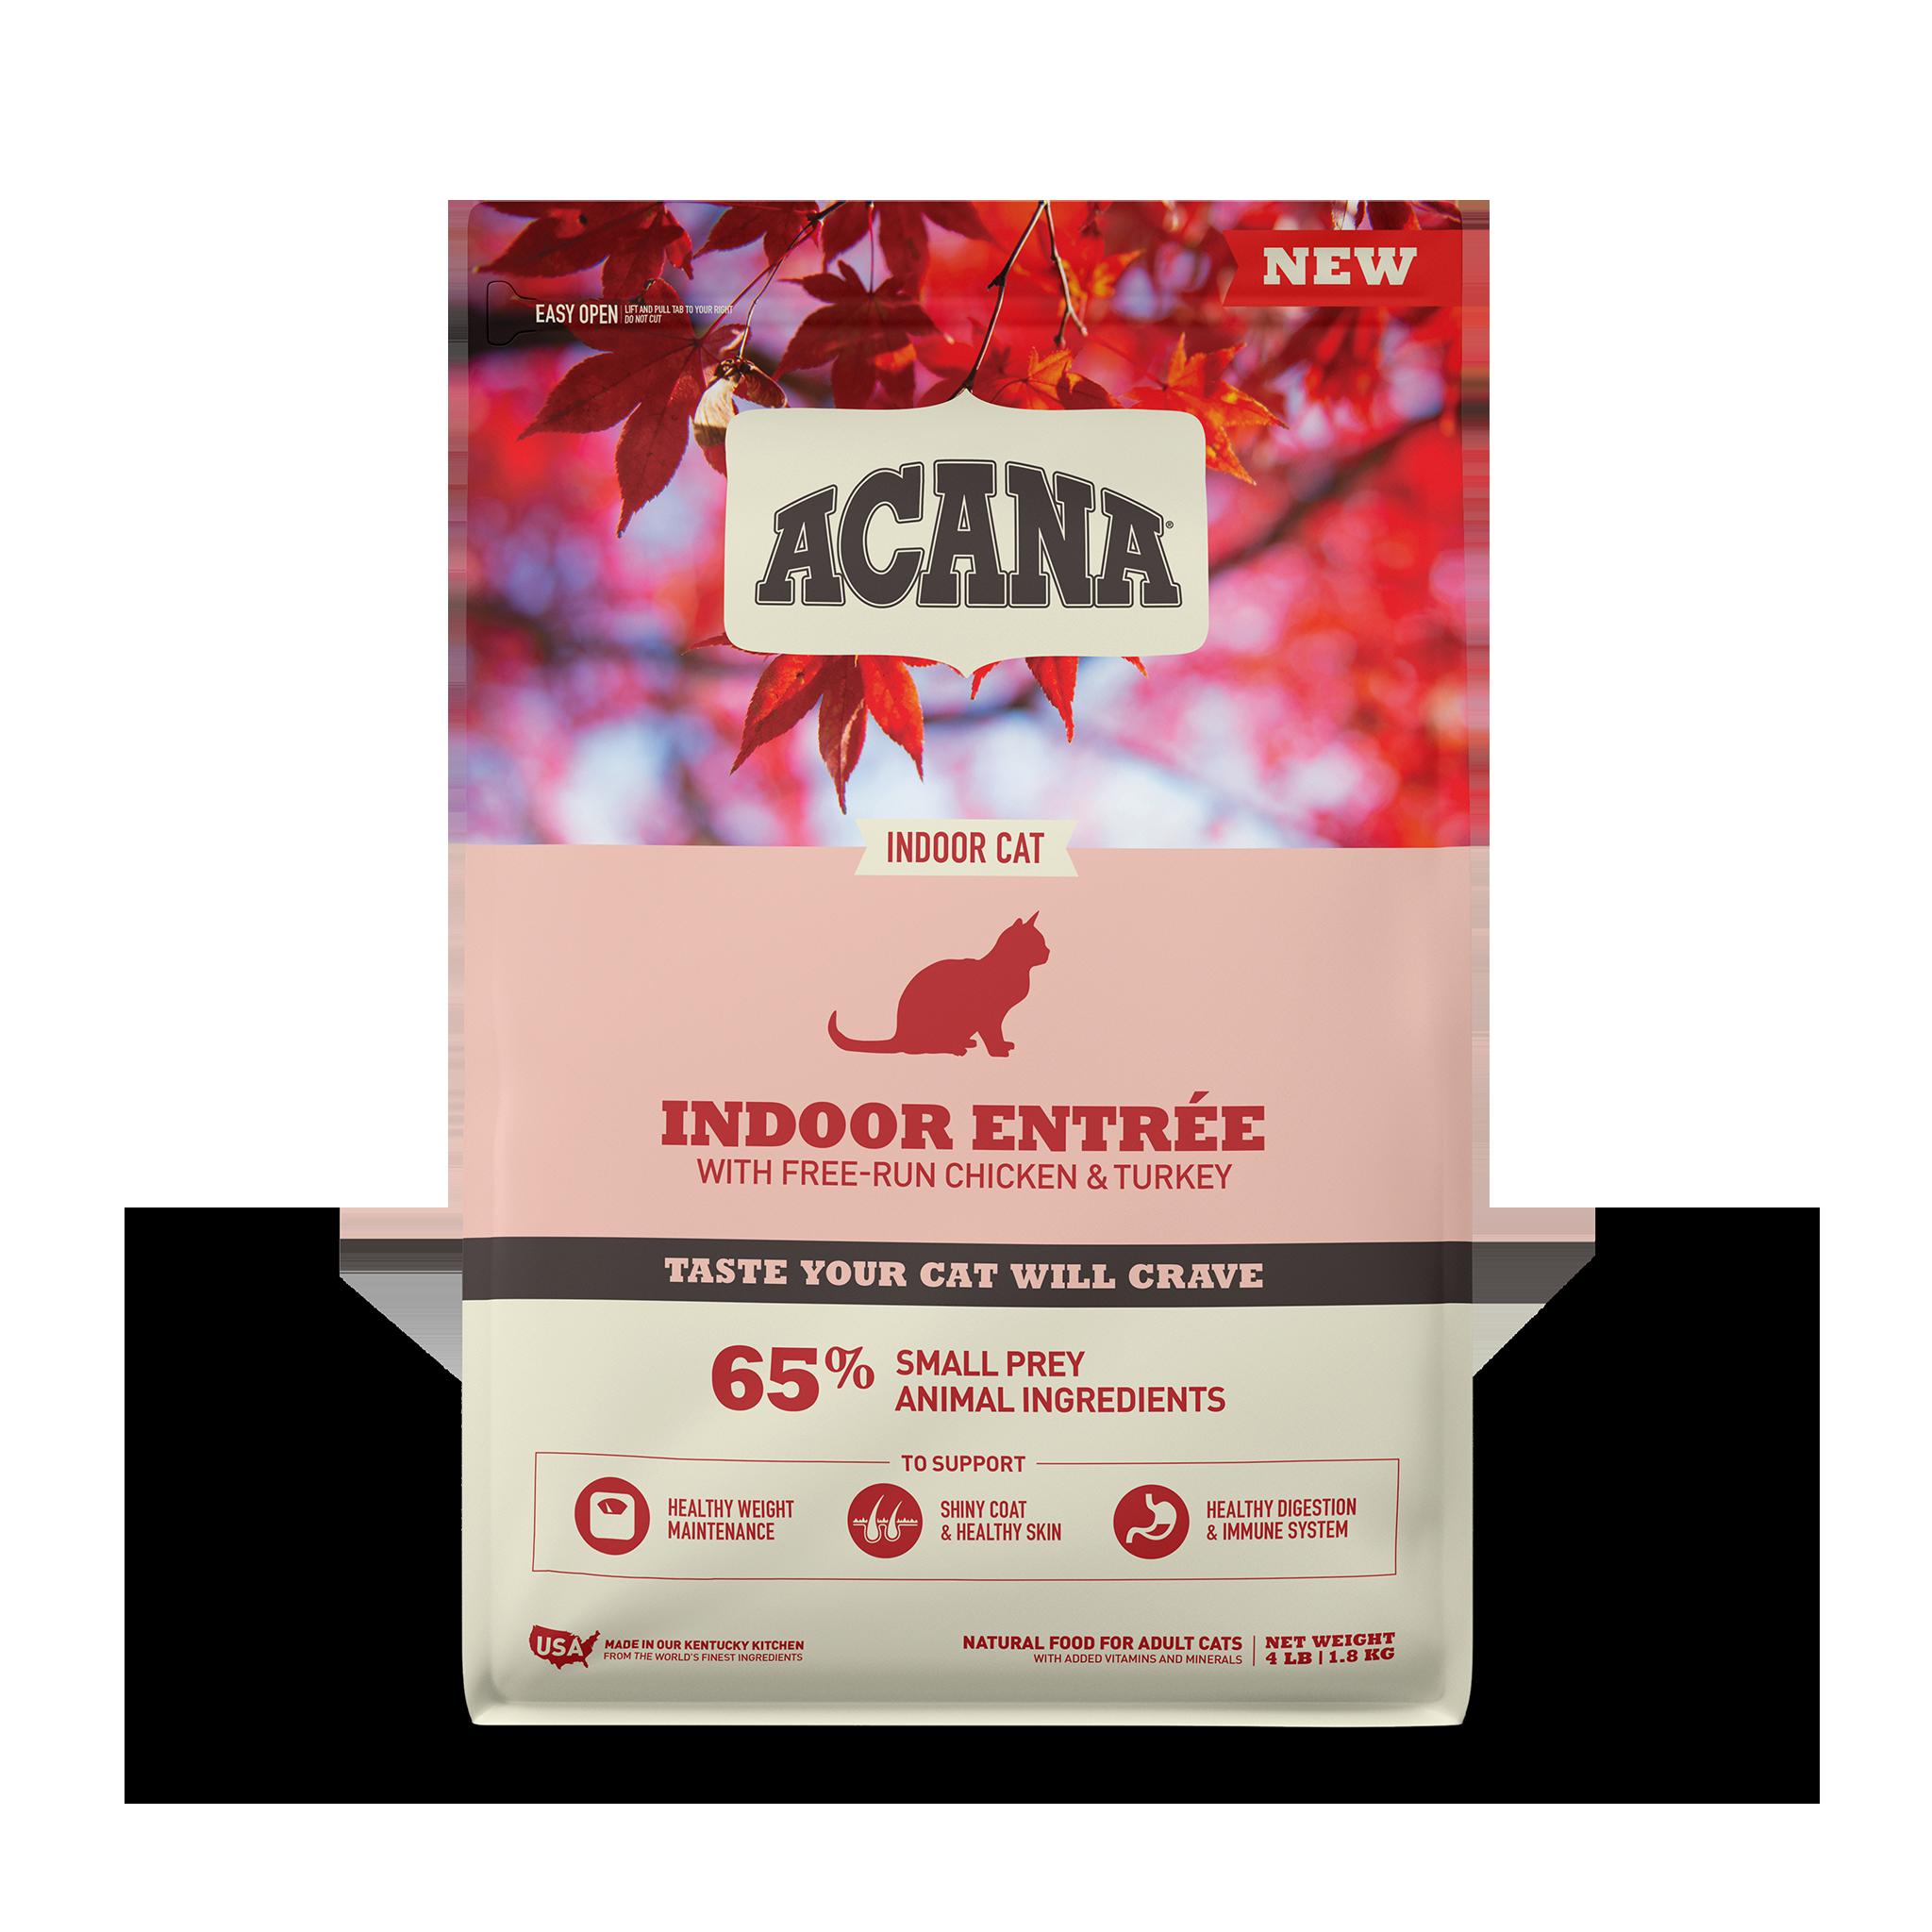 Acana Acana Indoor Entree Dry Cat Food